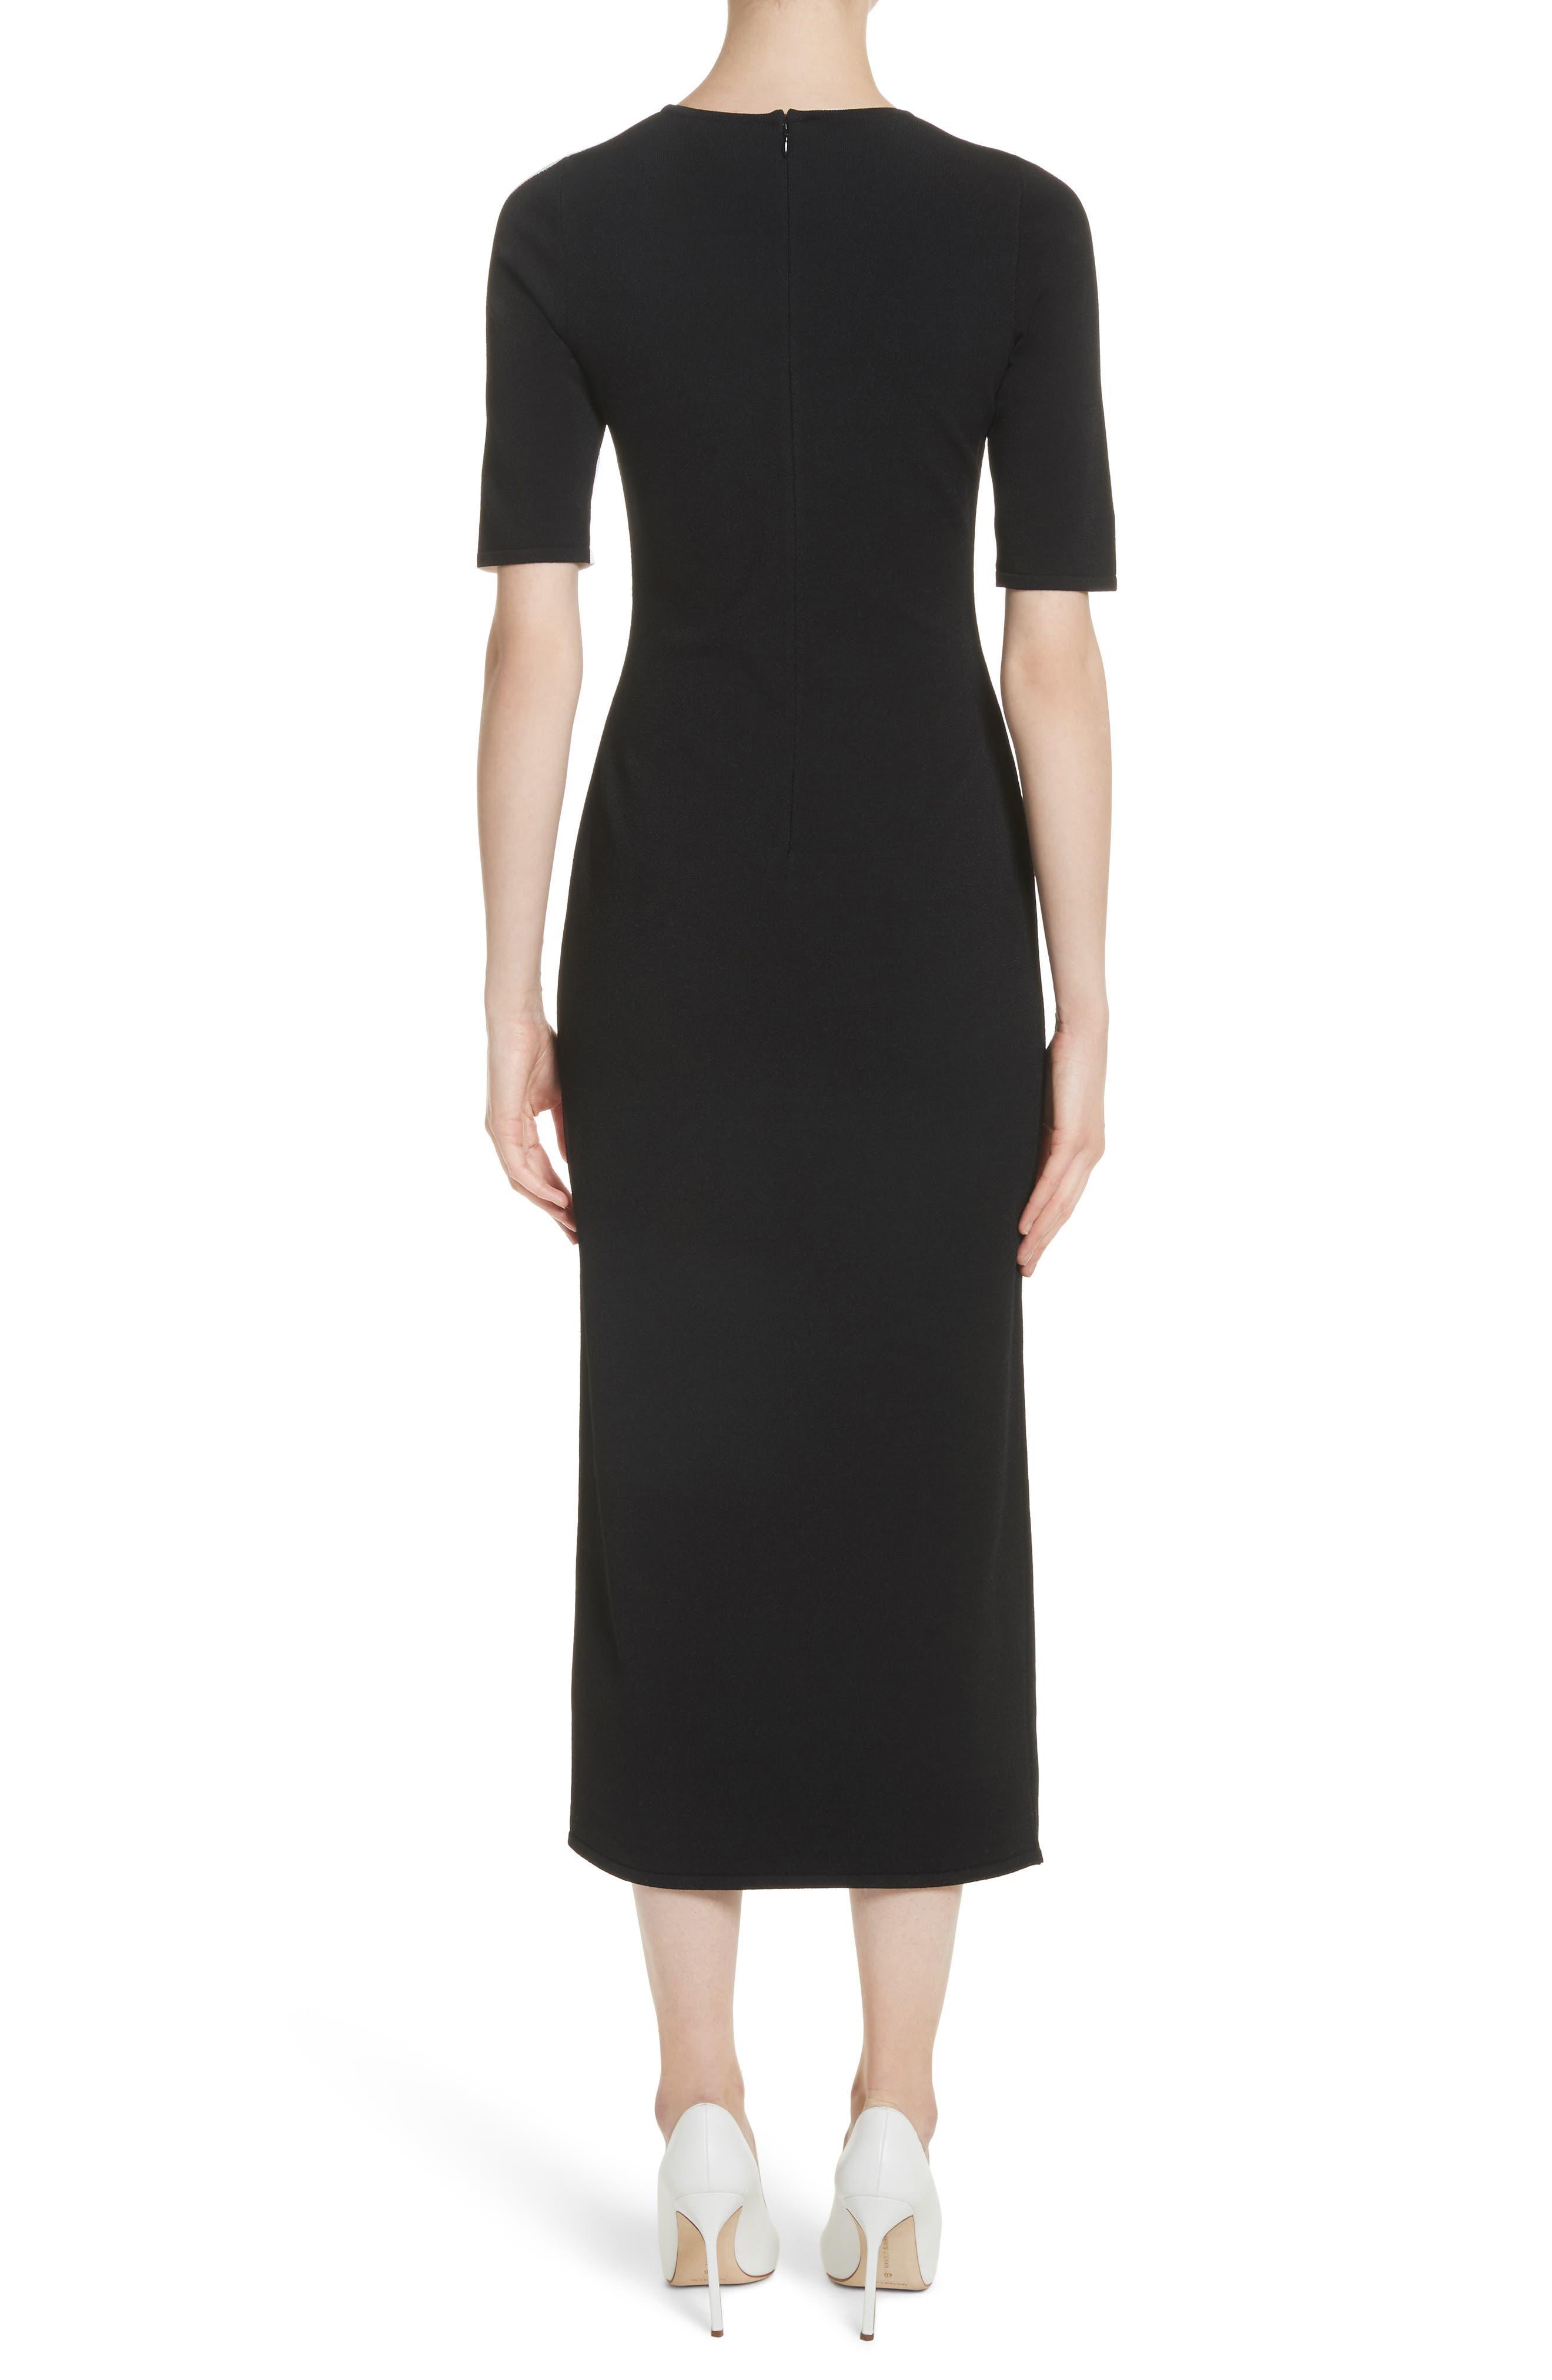 Intarsia Leaf Print Dress,                             Alternate thumbnail 2, color,                             White/ Black/ Evergreen